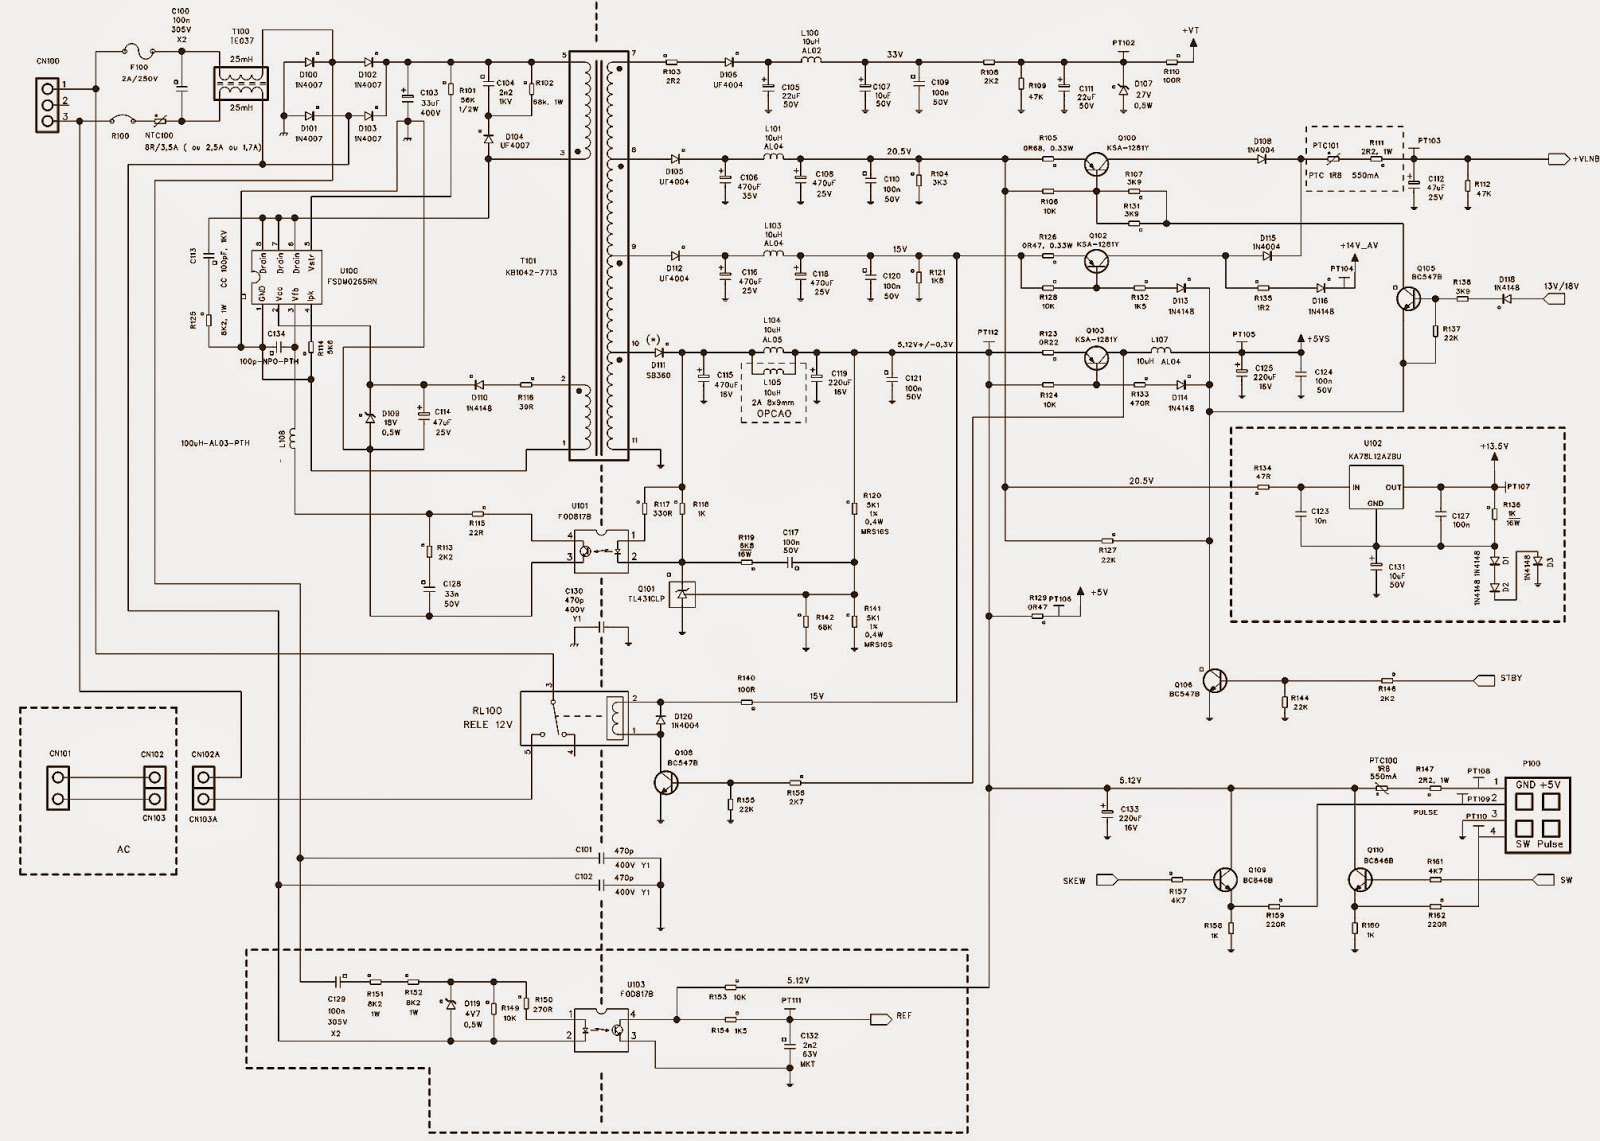 cisco set top box circuit diagram all kind of wiring diagrams u2022 verizon fios set [ 1600 x 1141 Pixel ]